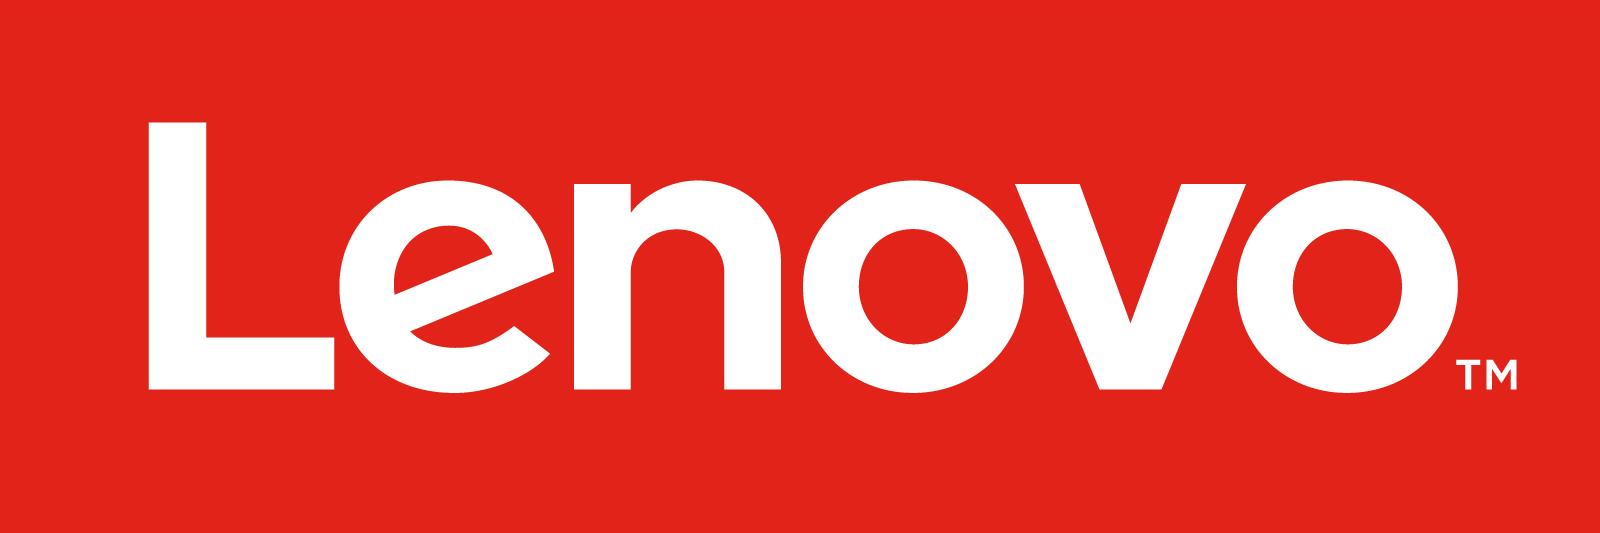 Lenovo 2017 model all flash file free download - Rom Develop